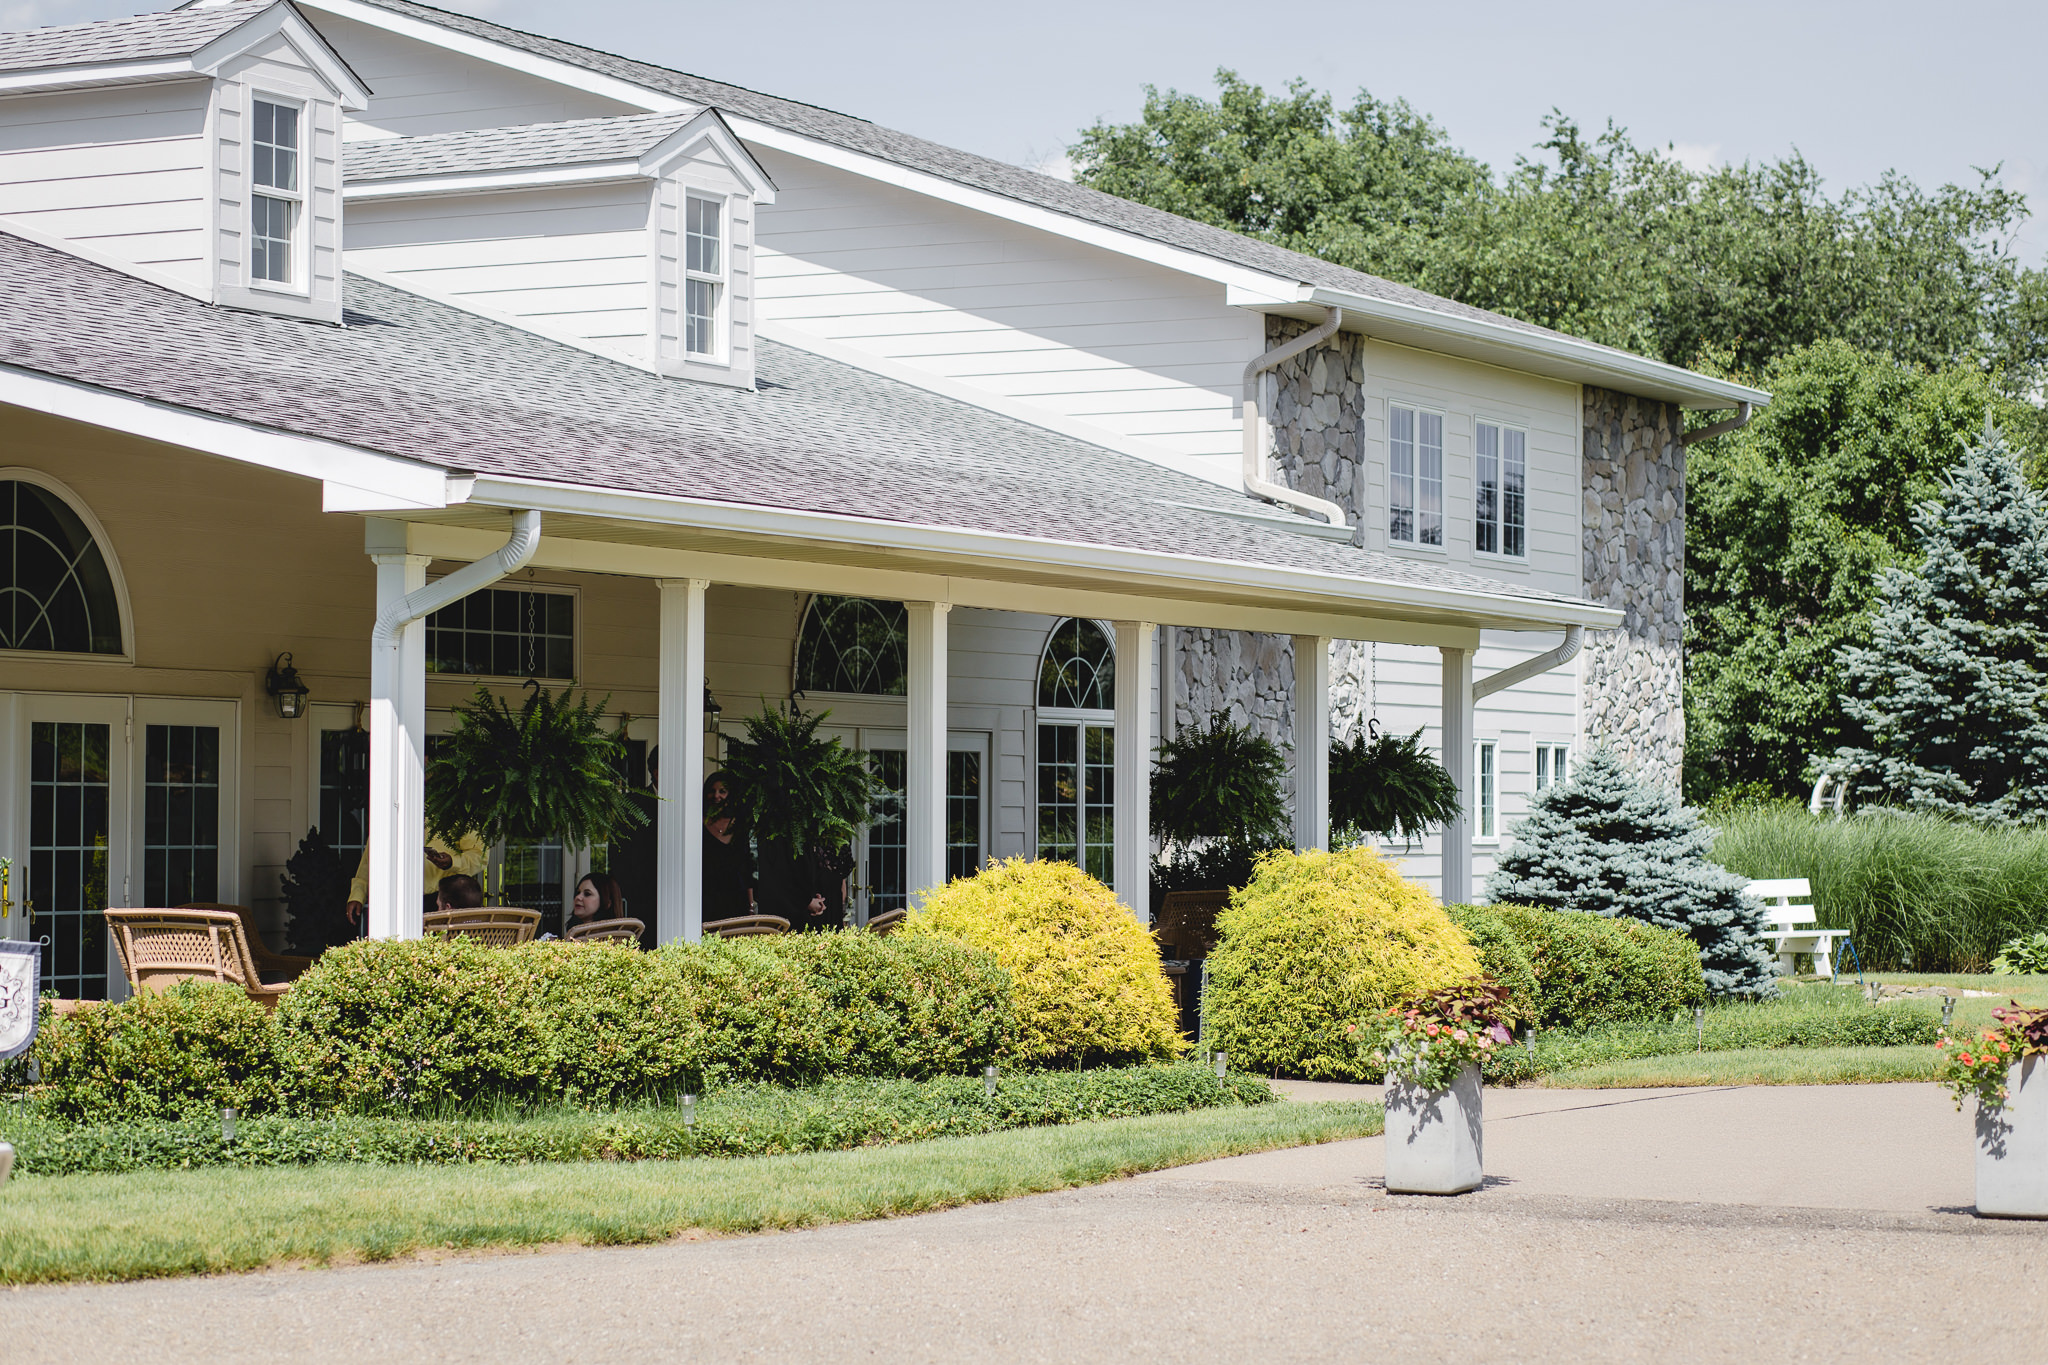 Greystone Fields wedding venue in Gibsonia, PA